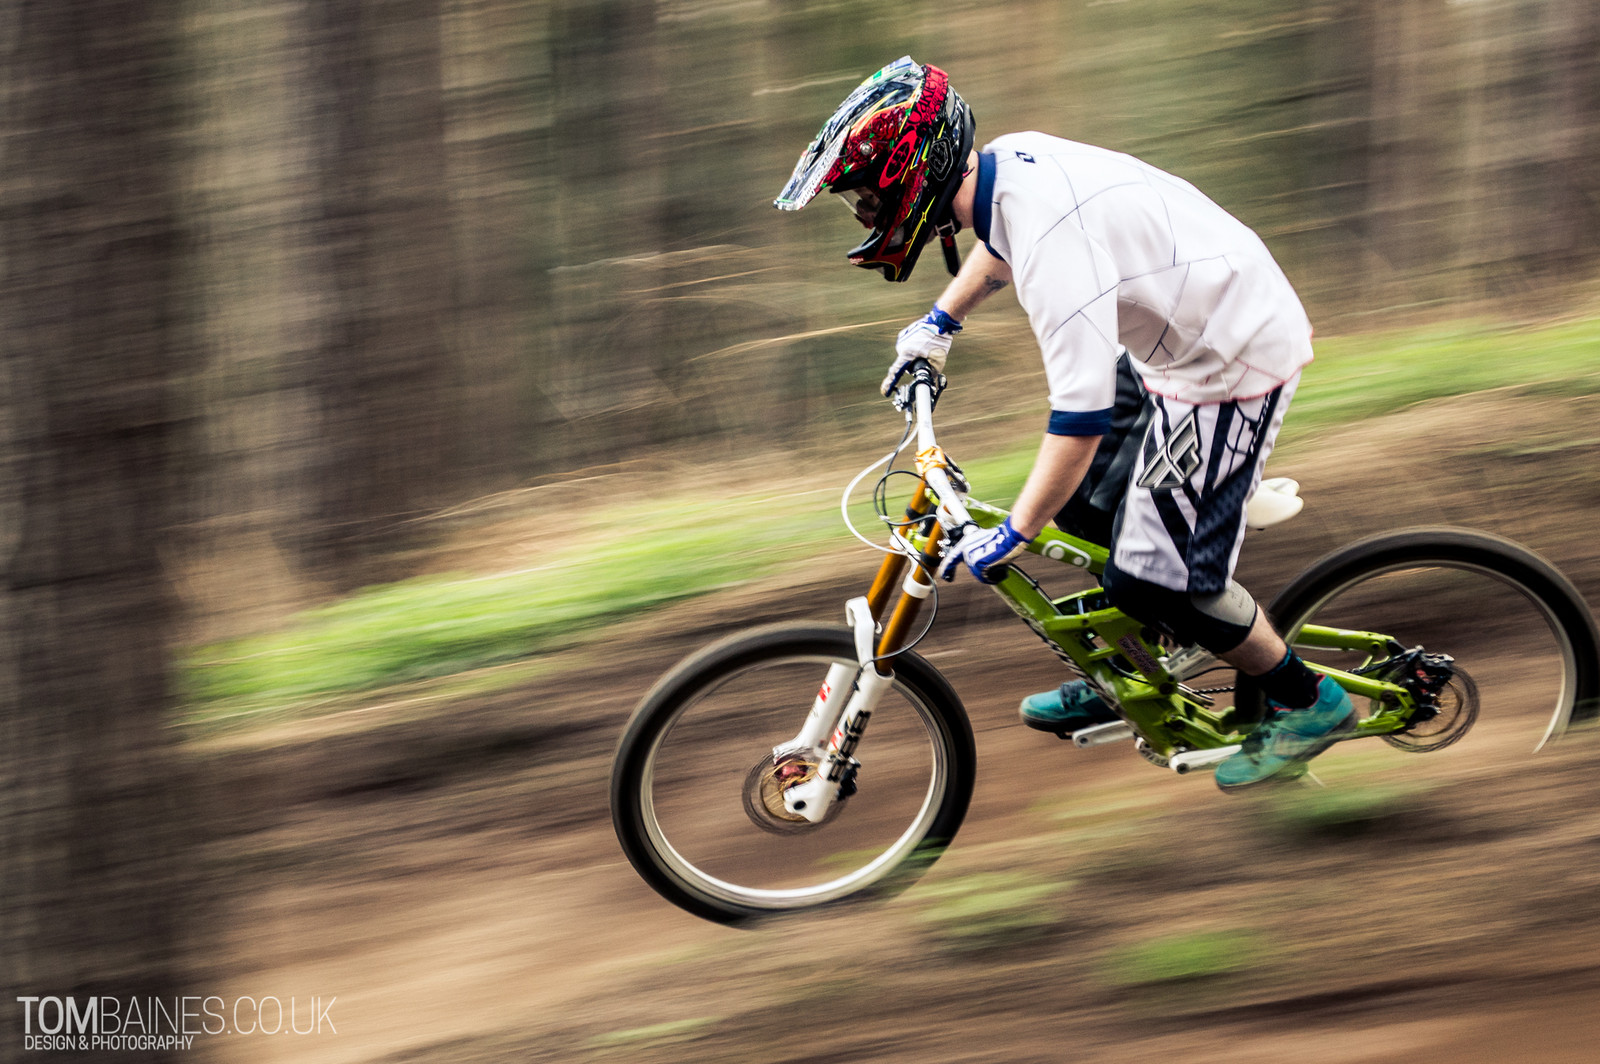 Blurry - KillerXL5 - Mountain Biking Pictures - Vital MTB